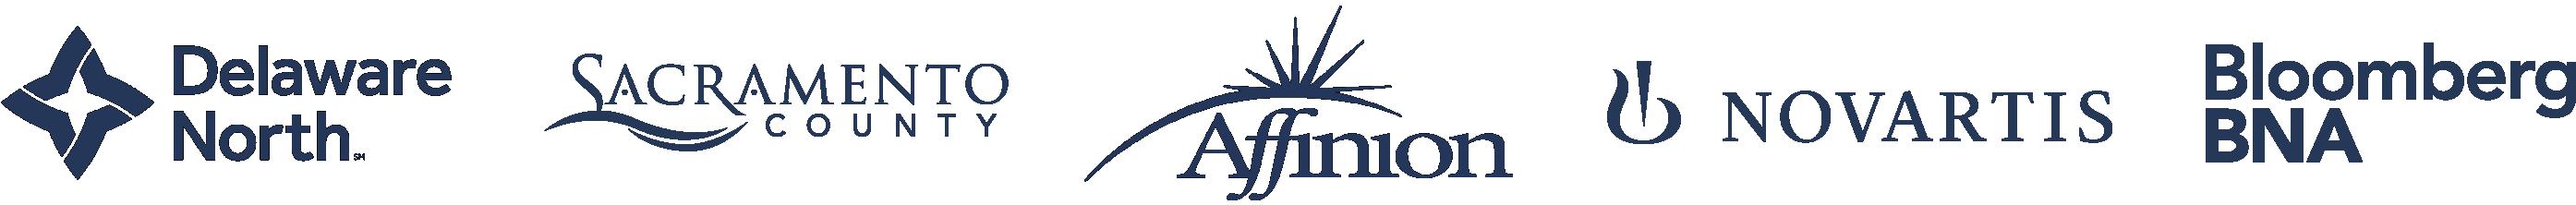 Logo-Balken: Delaware North, Sacramento County, Affinion, Novartis und Bloomberg BNA